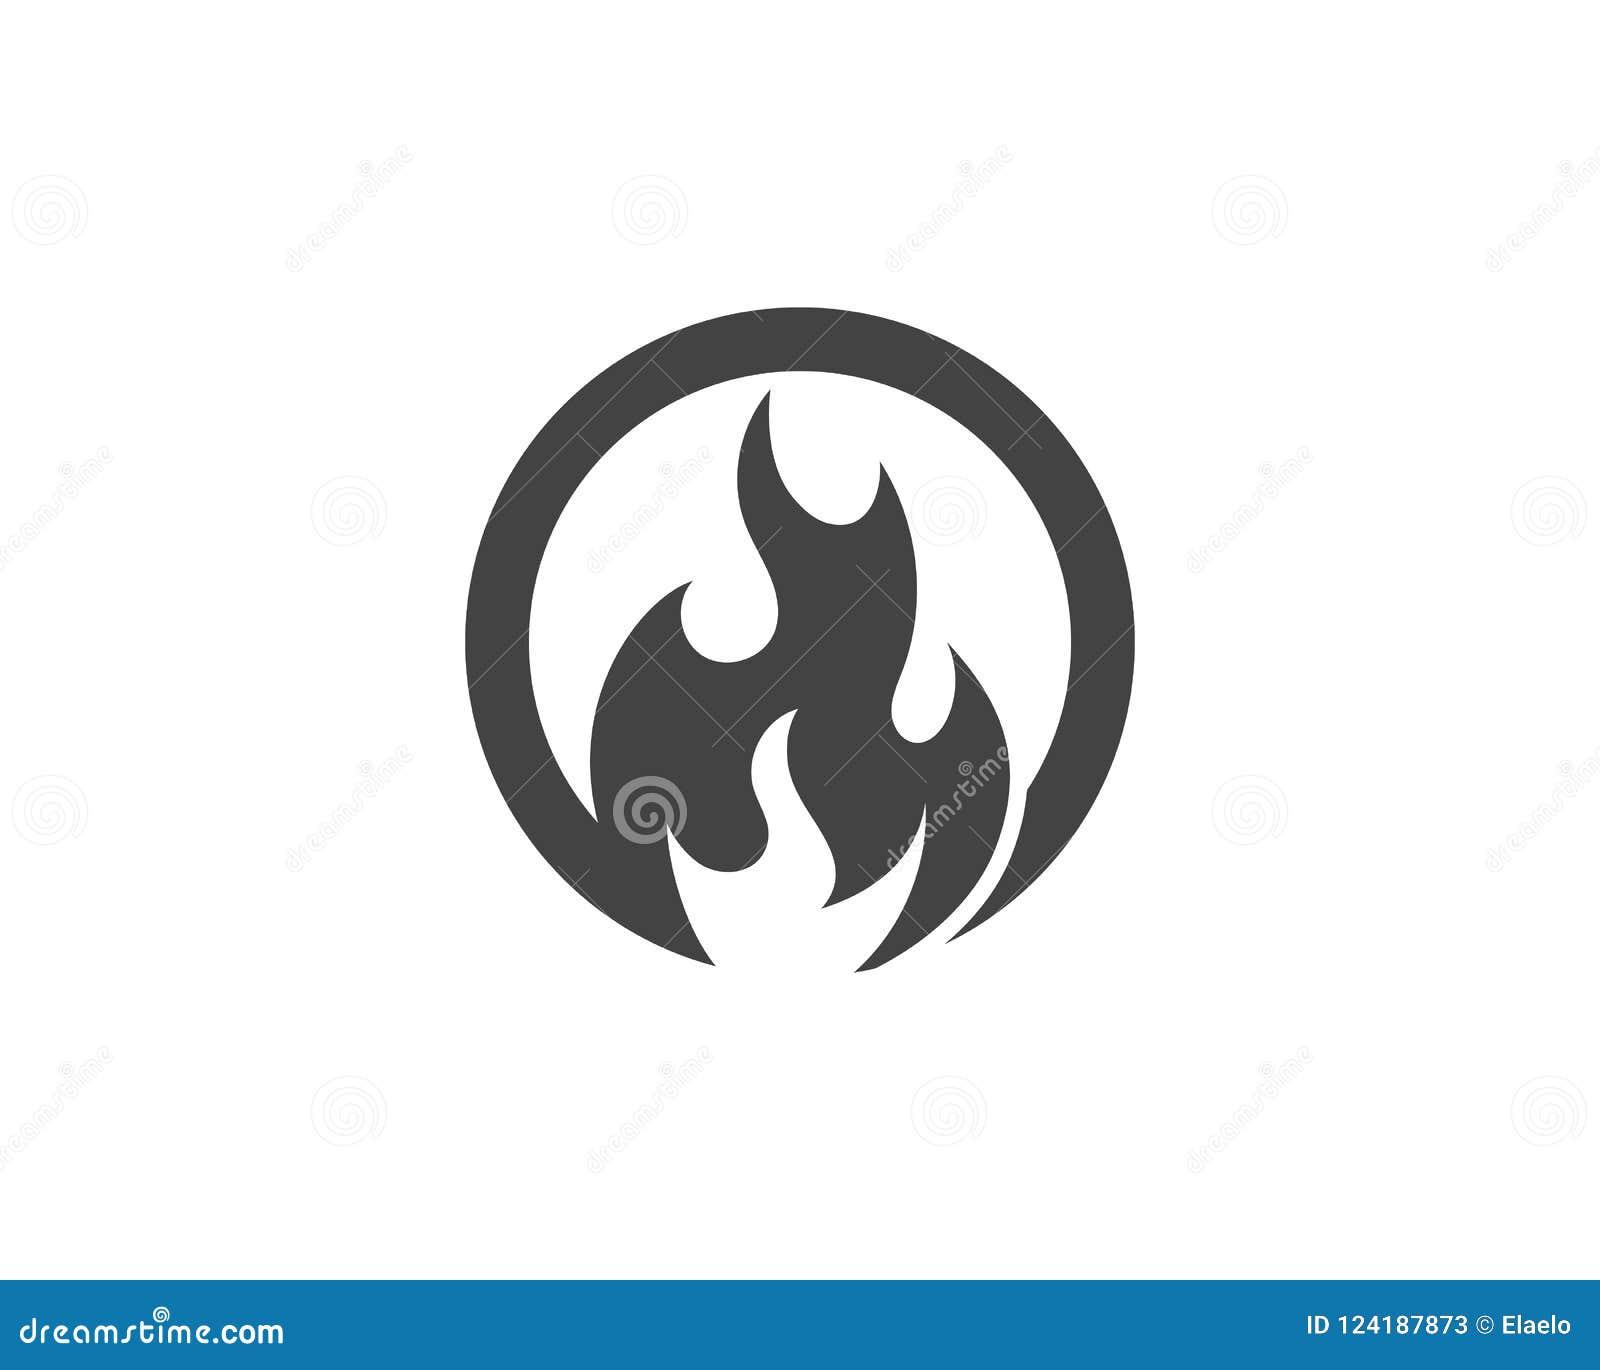 fire flame illustration stock illustration illustration of abstract